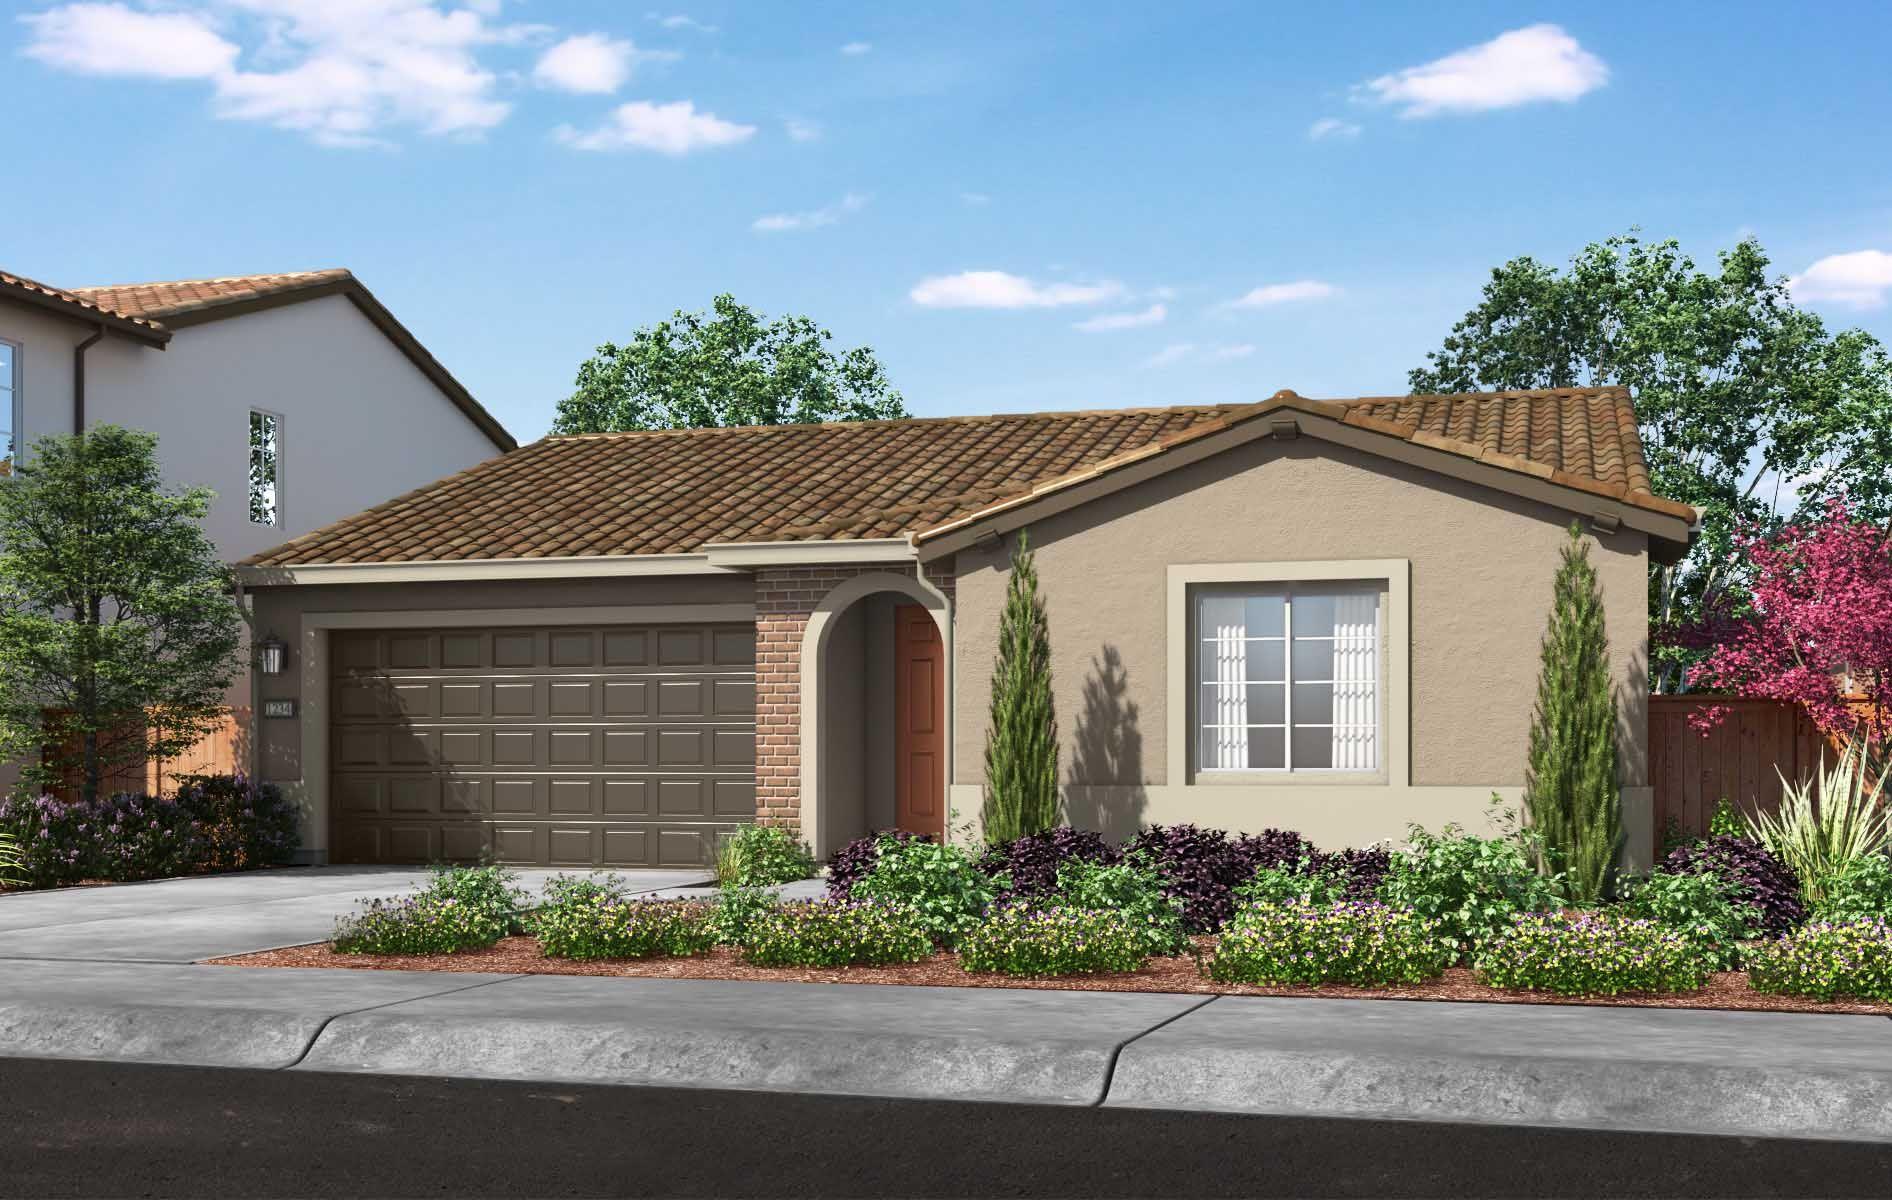 TPH-residence-BS_PD_TriPointe-SAC_La-Madera_Plan-1:Plan 1 Exterior Style: Adobe Ranch